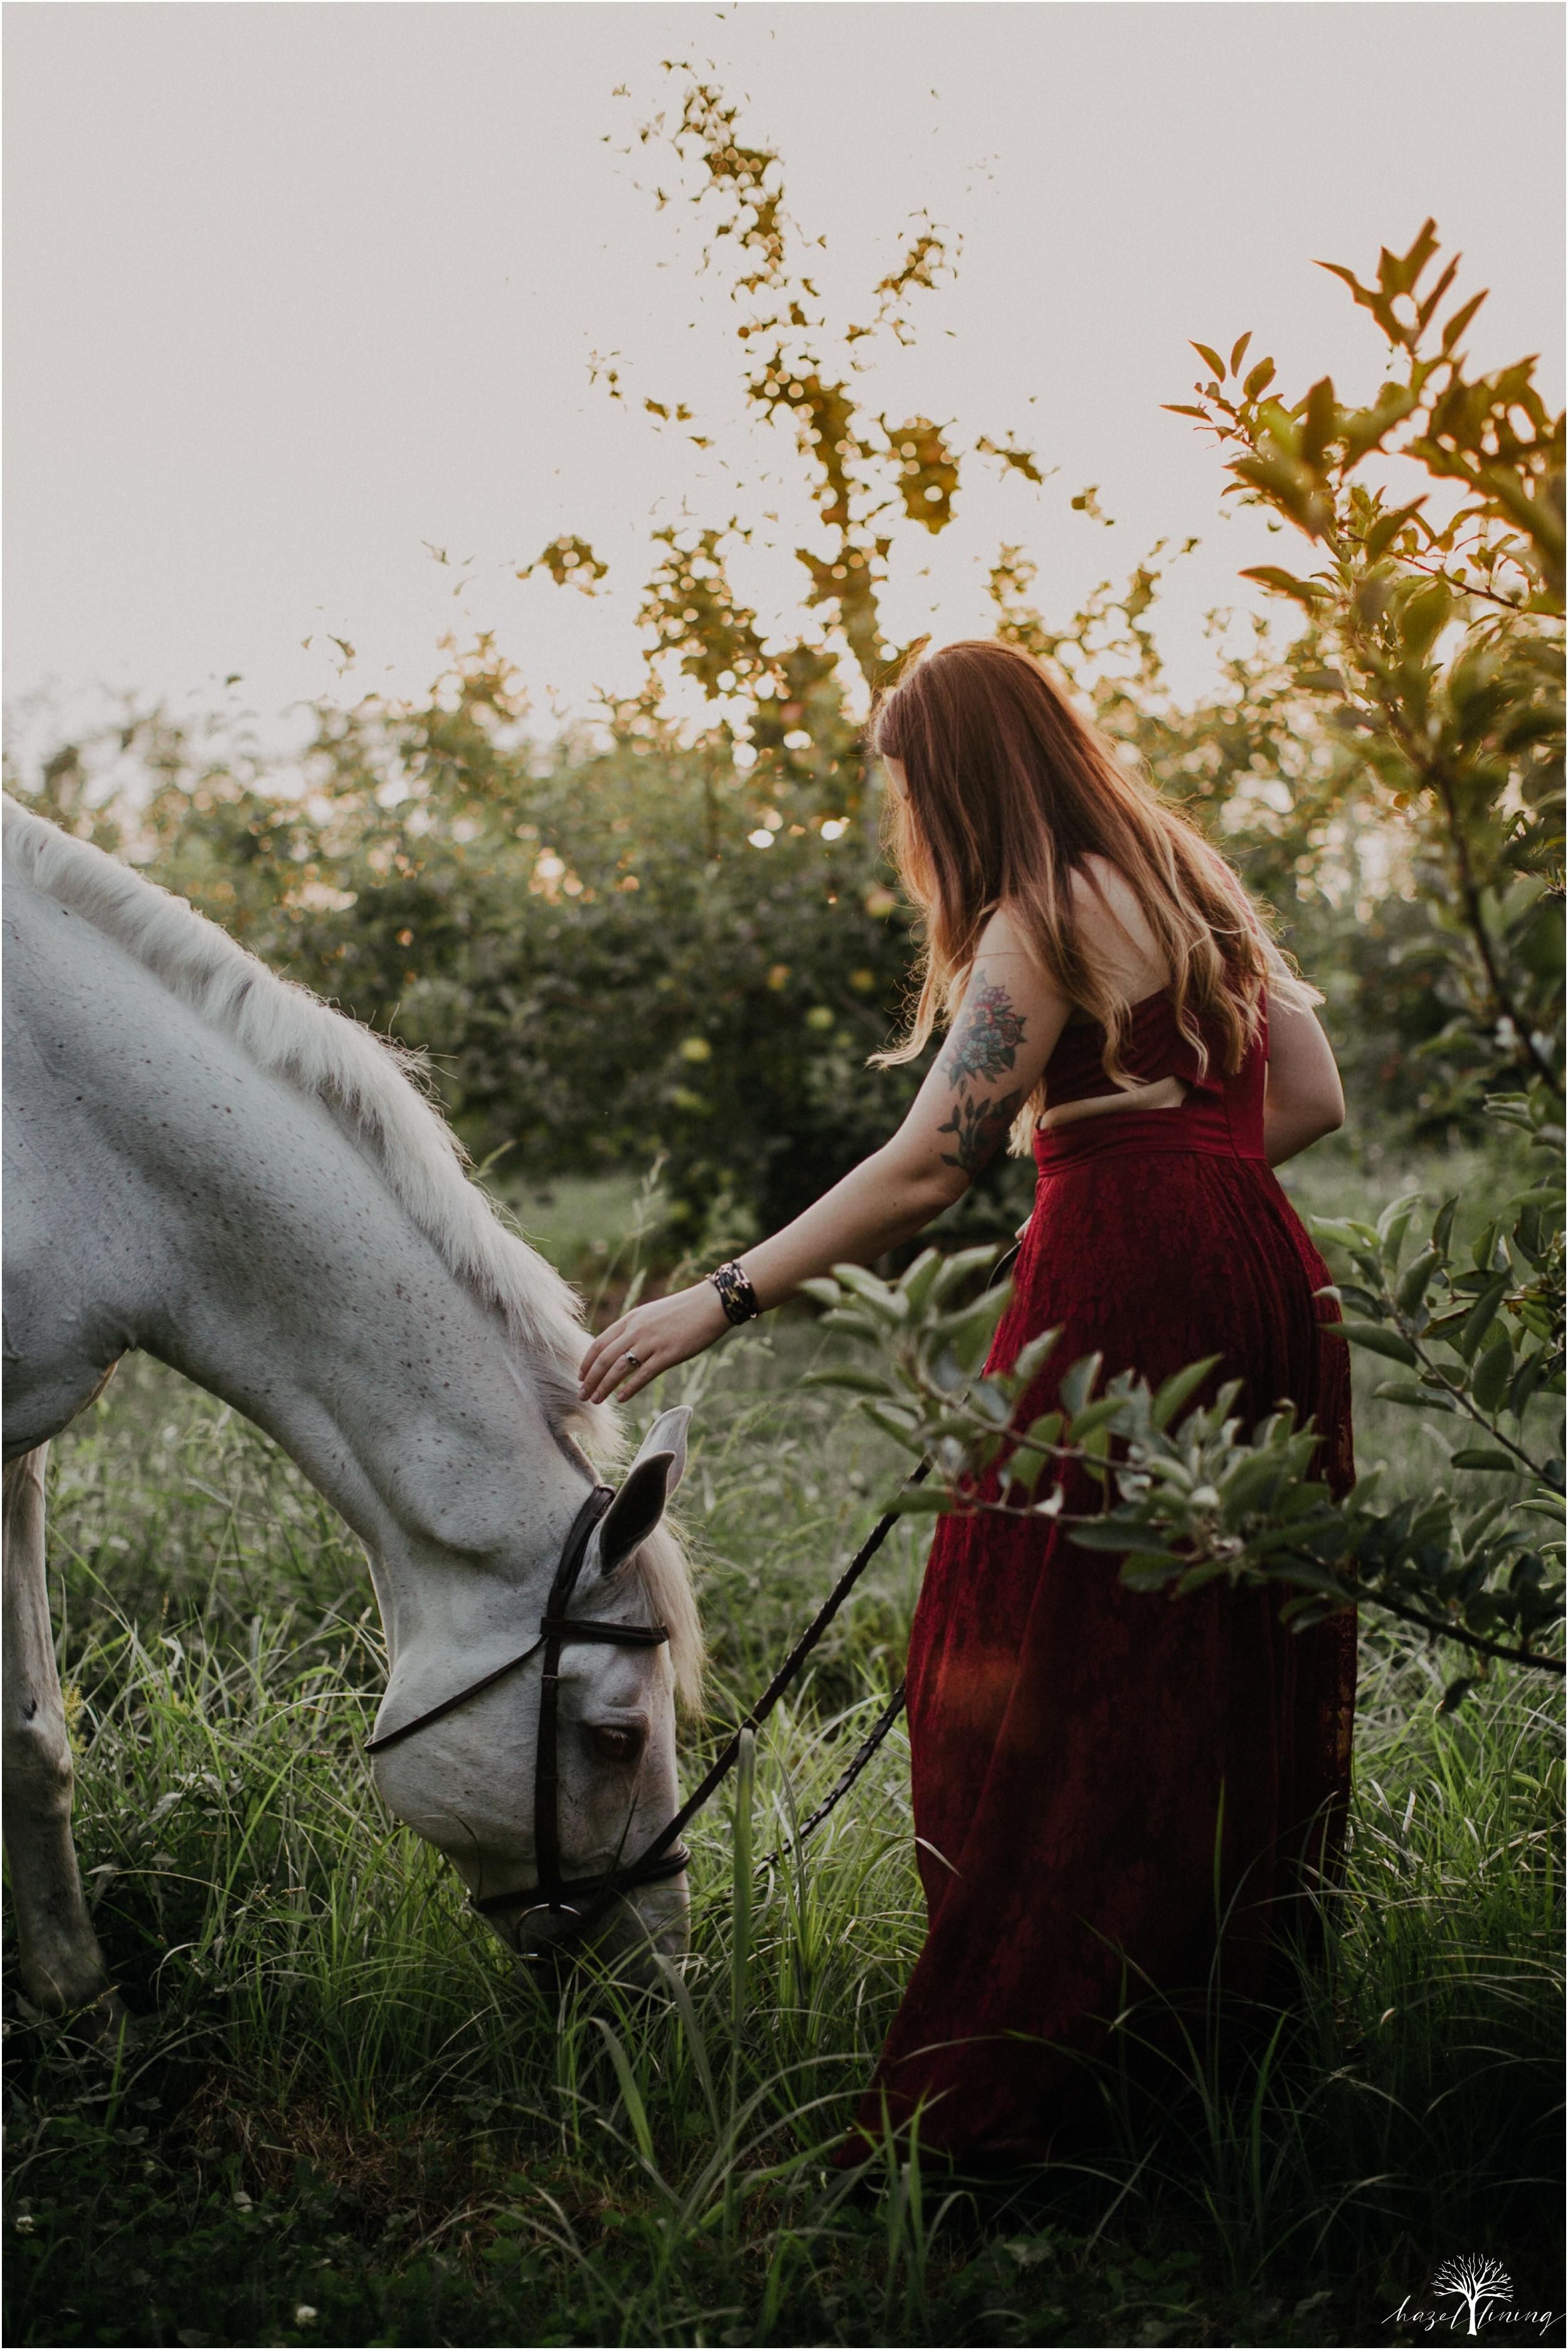 taylor-adams-and-horse-delaware-valley-university-delval-summer-equestrian-portrait-session-hazel-lining-photography-destination-elopement-wedding-engagement-photography_0075.jpg